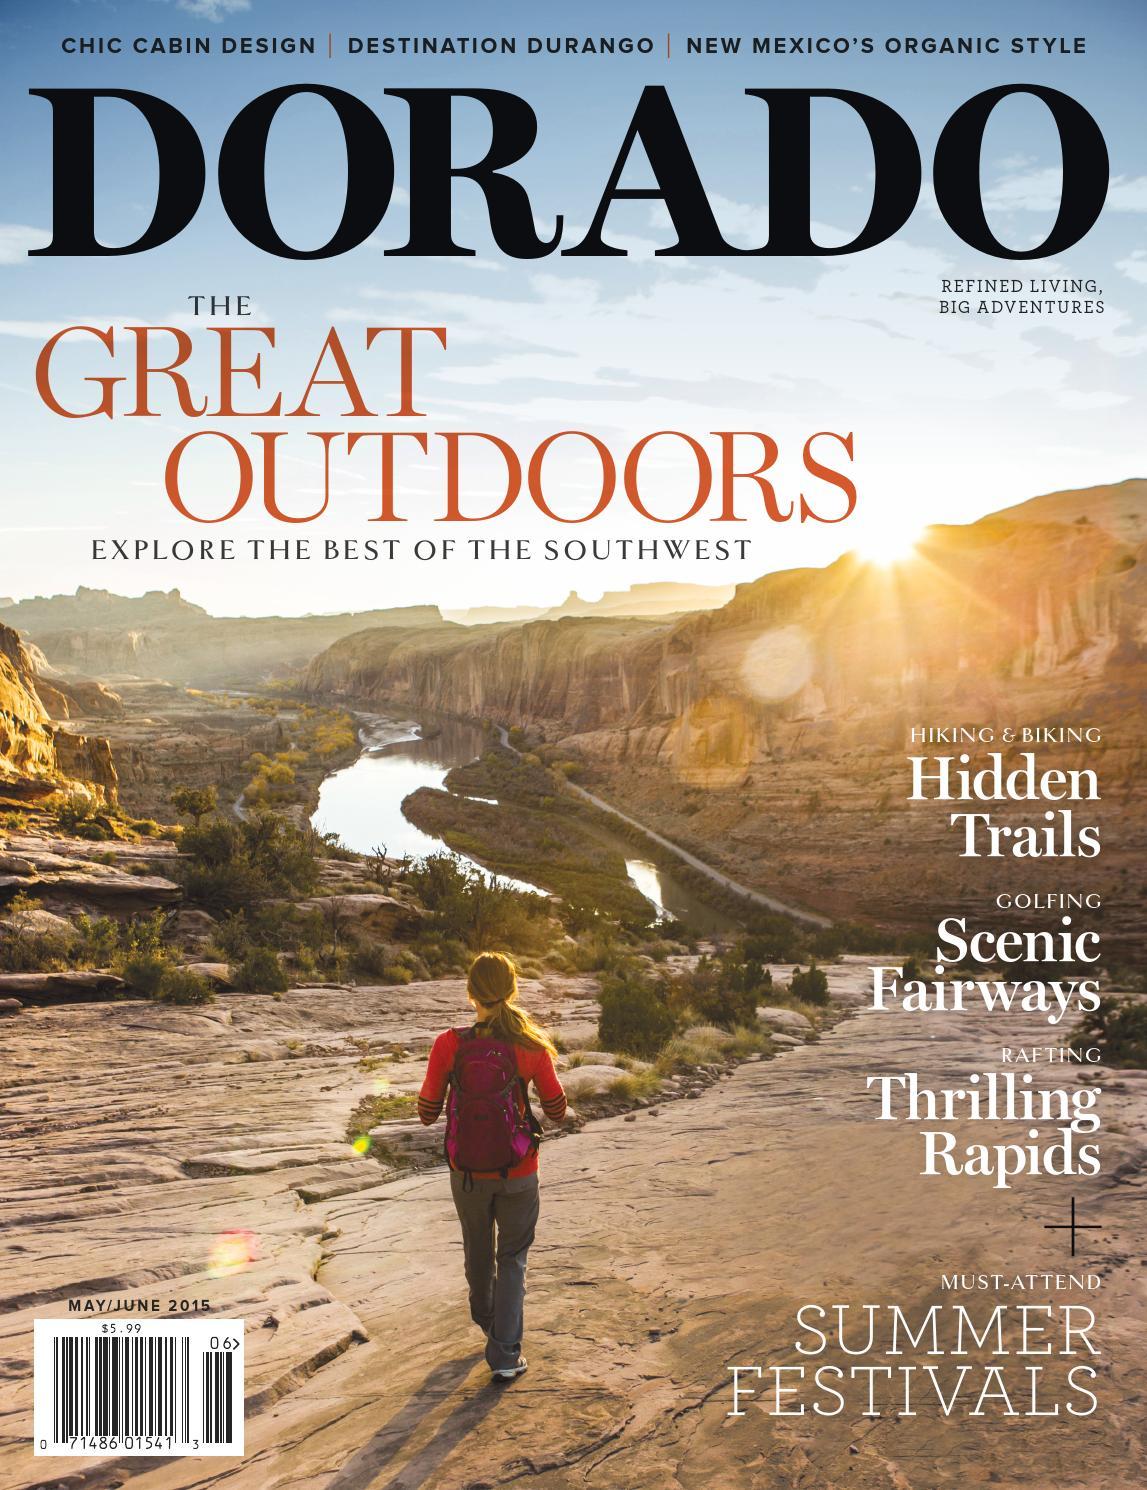 Dorado Magazine - May June 2015 by Ballantine Communications - issuu a073c40500ca2